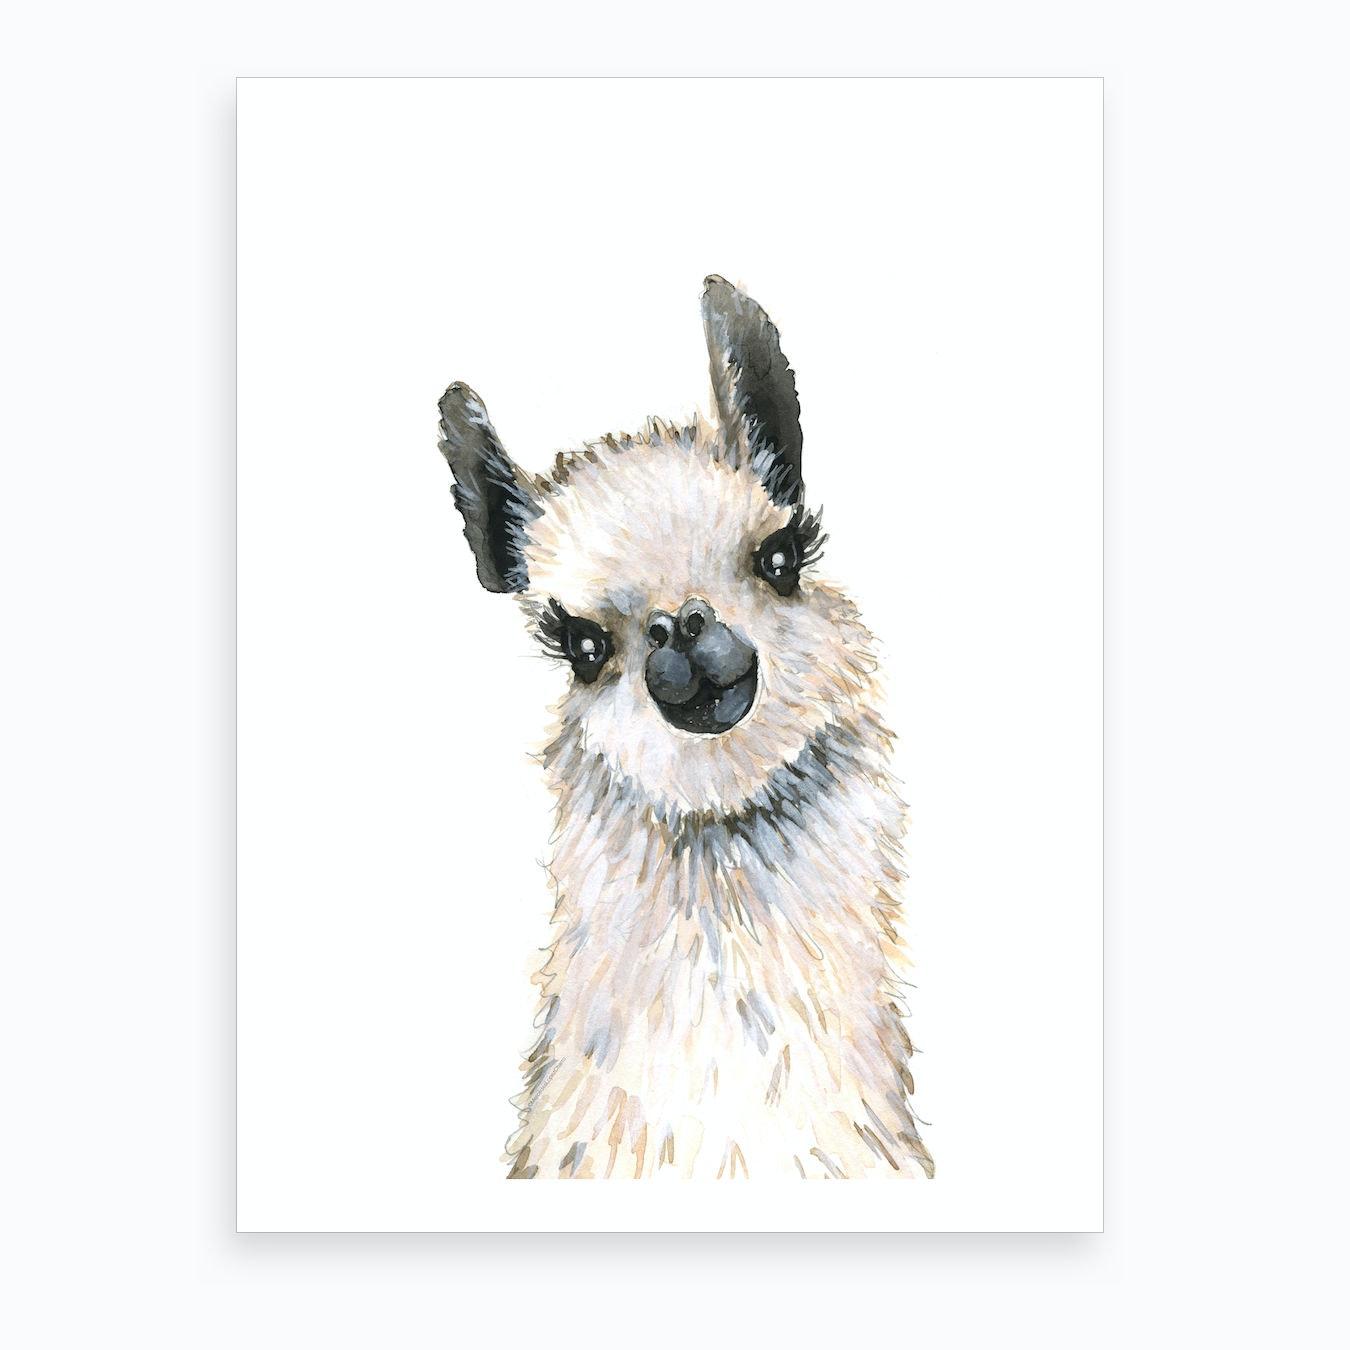 Baby Llama Art Print by Mercedes Lopez Charro - Fy